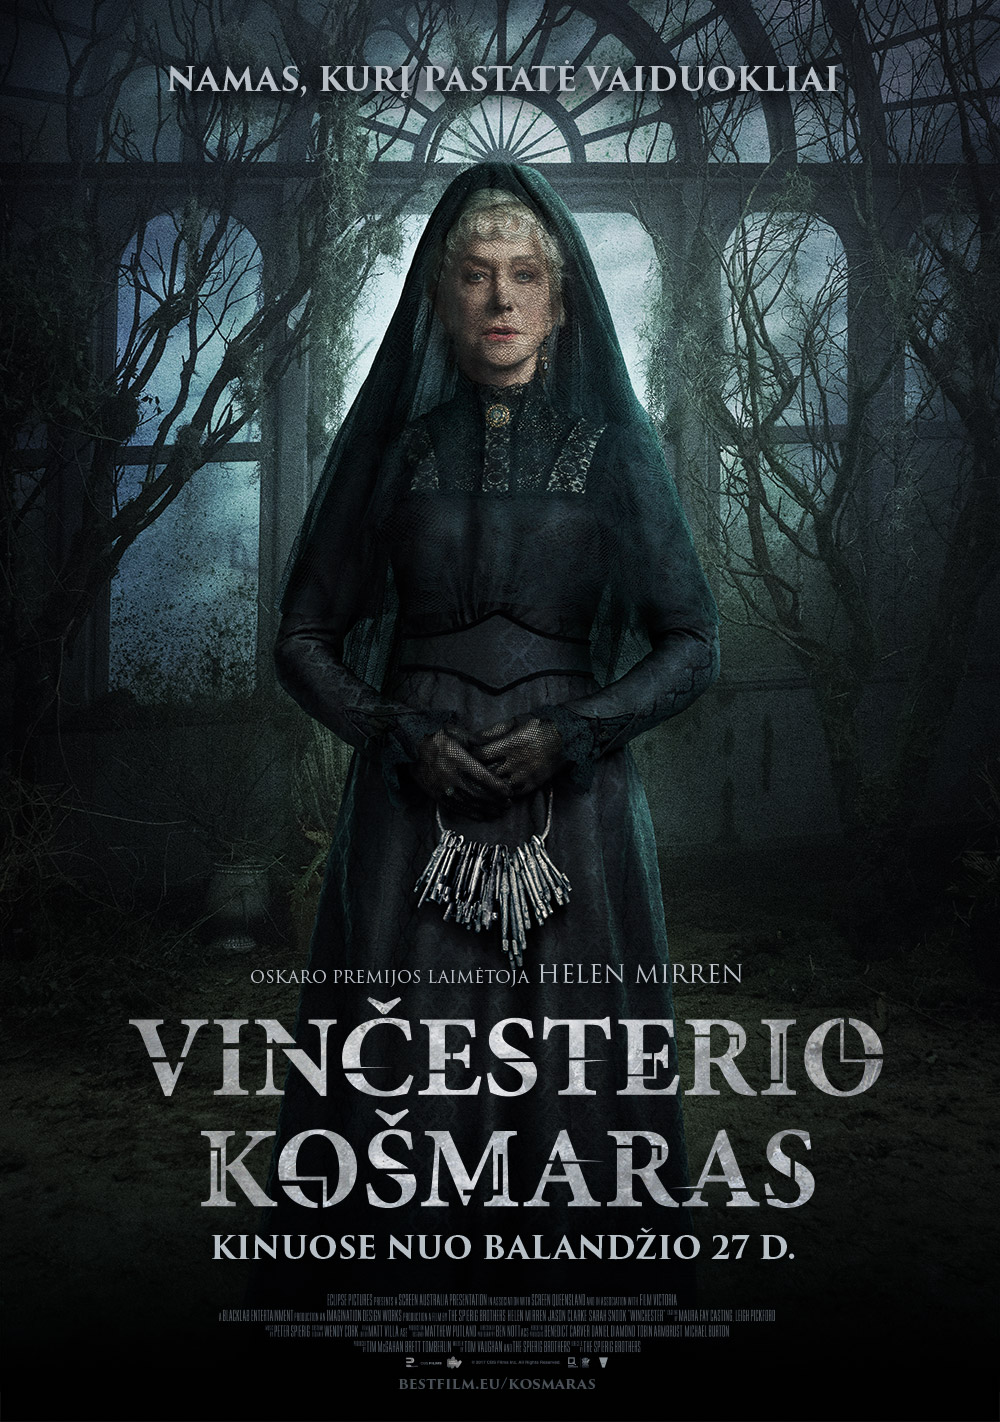 Vinčesterio košmaras (Winchester)